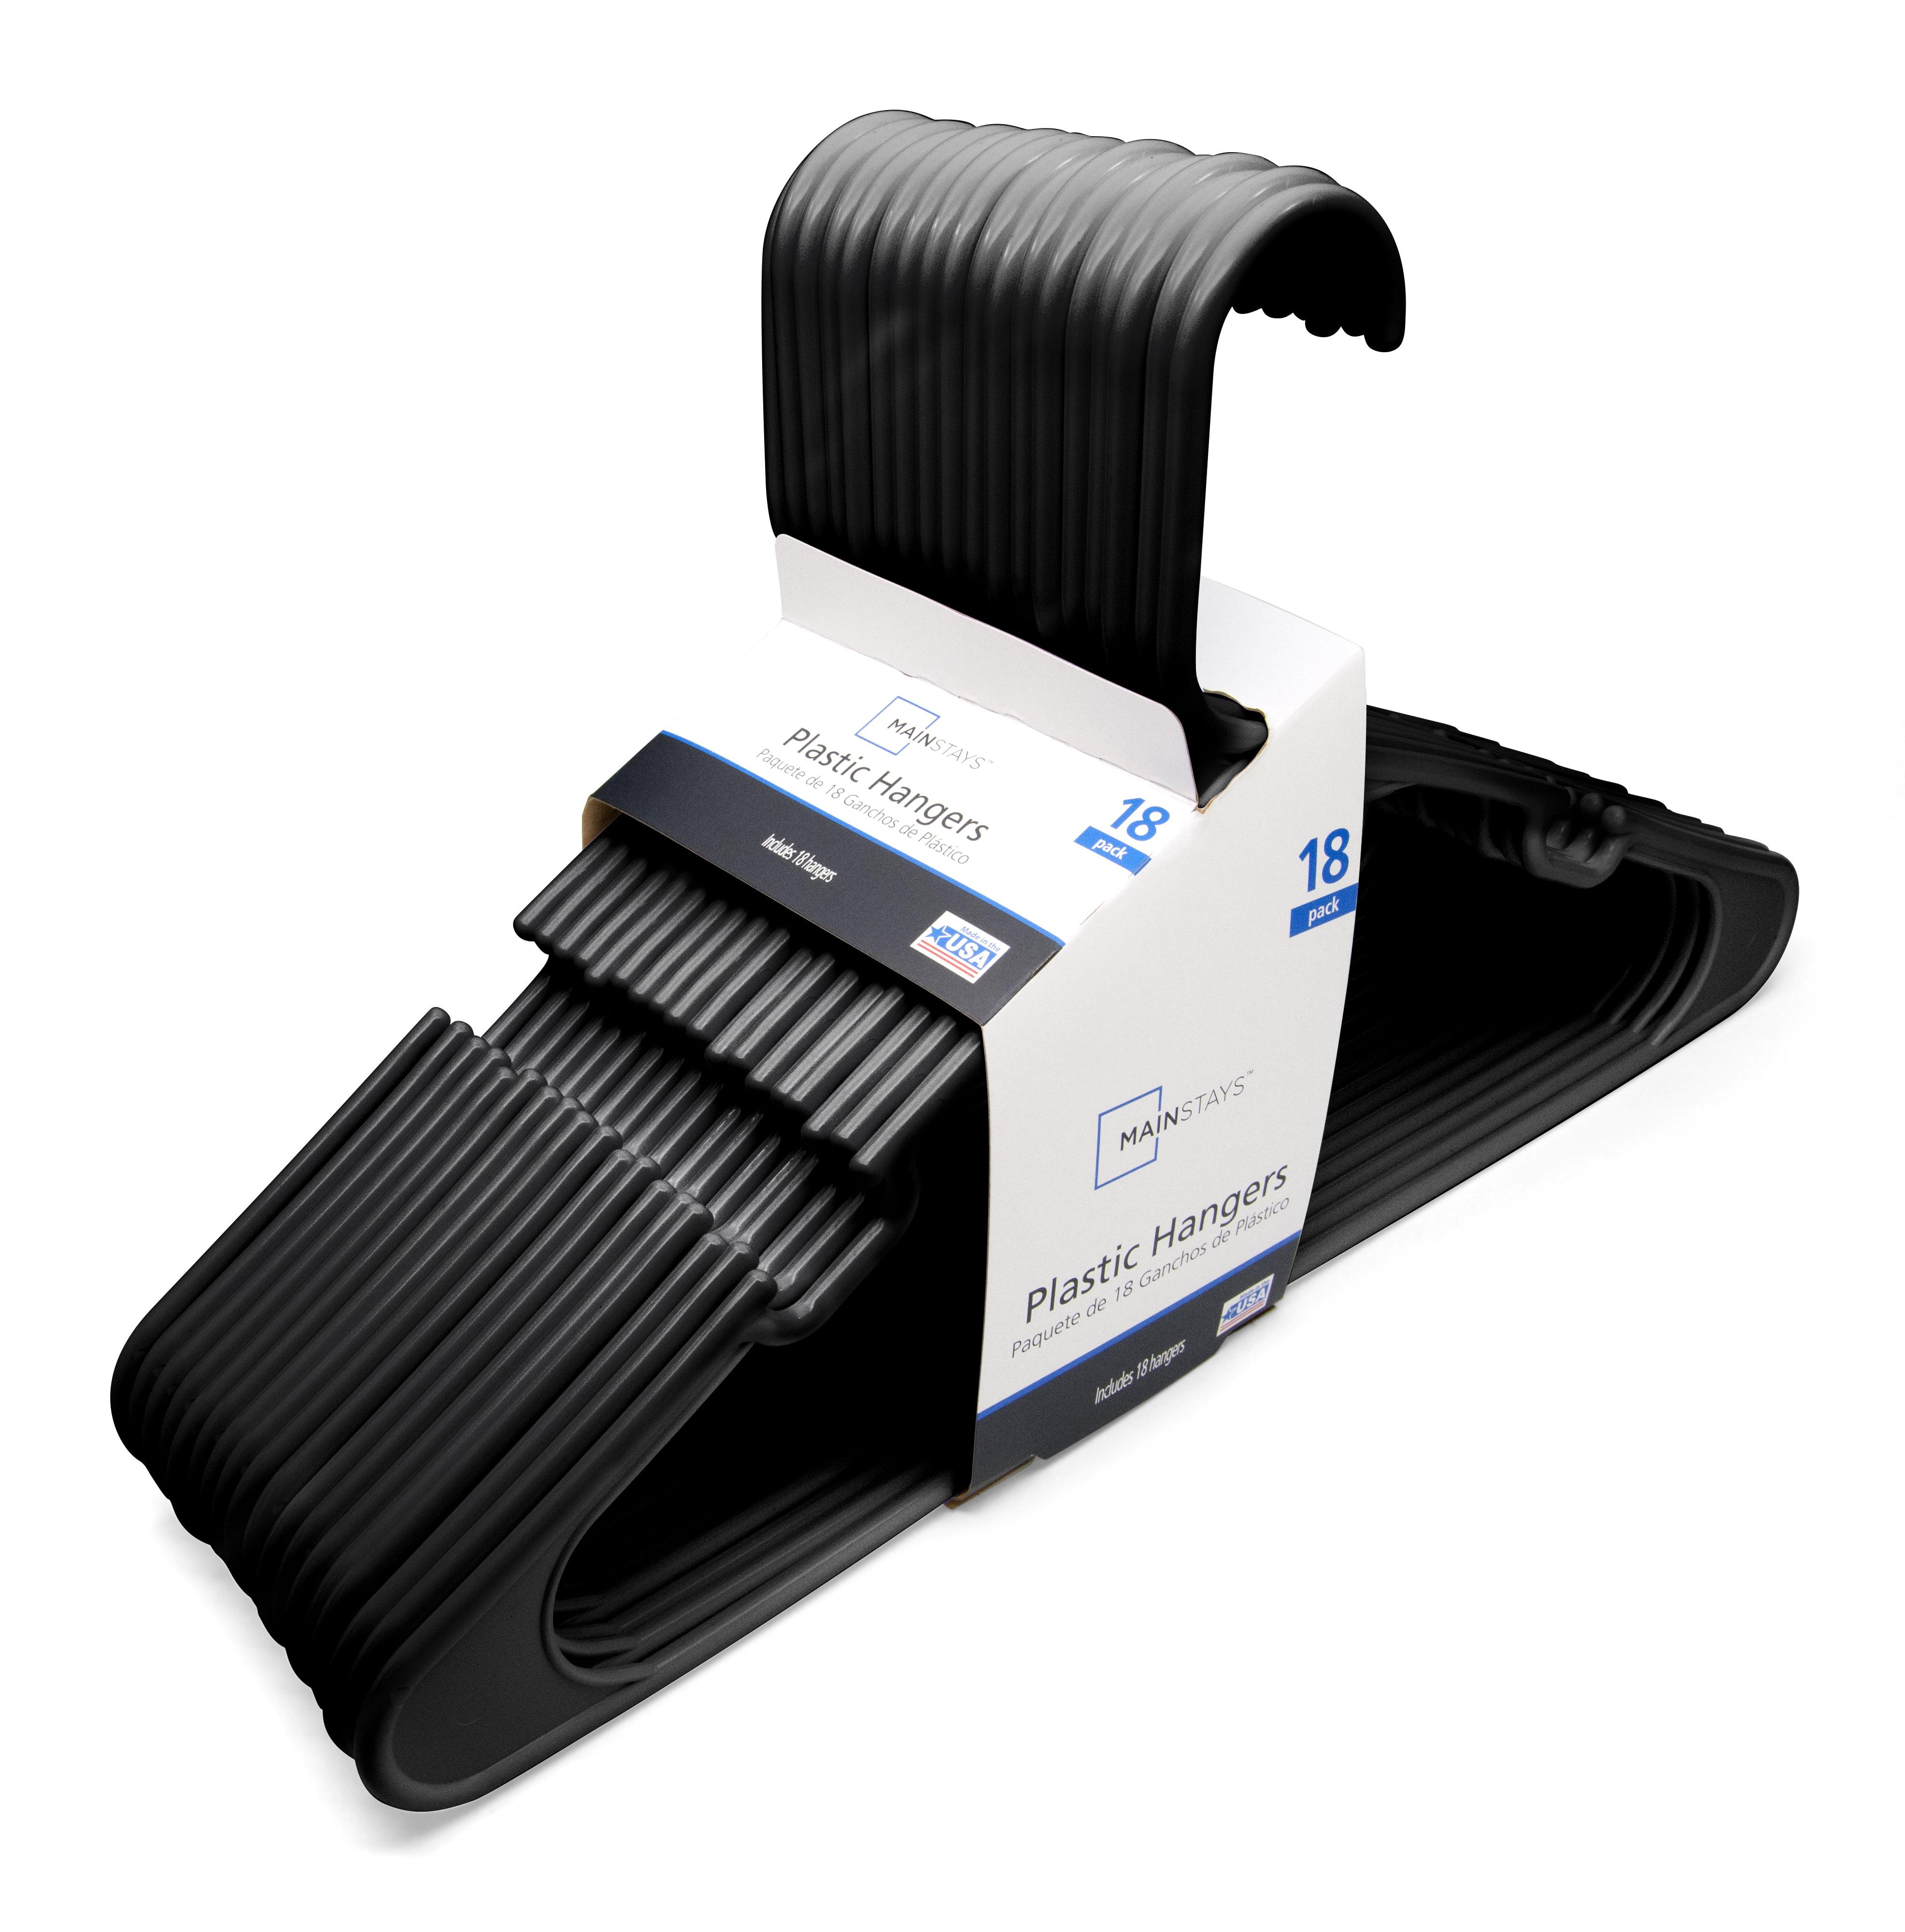 Mainstays 18 Pack Hangers - BLACK - Walmart.com